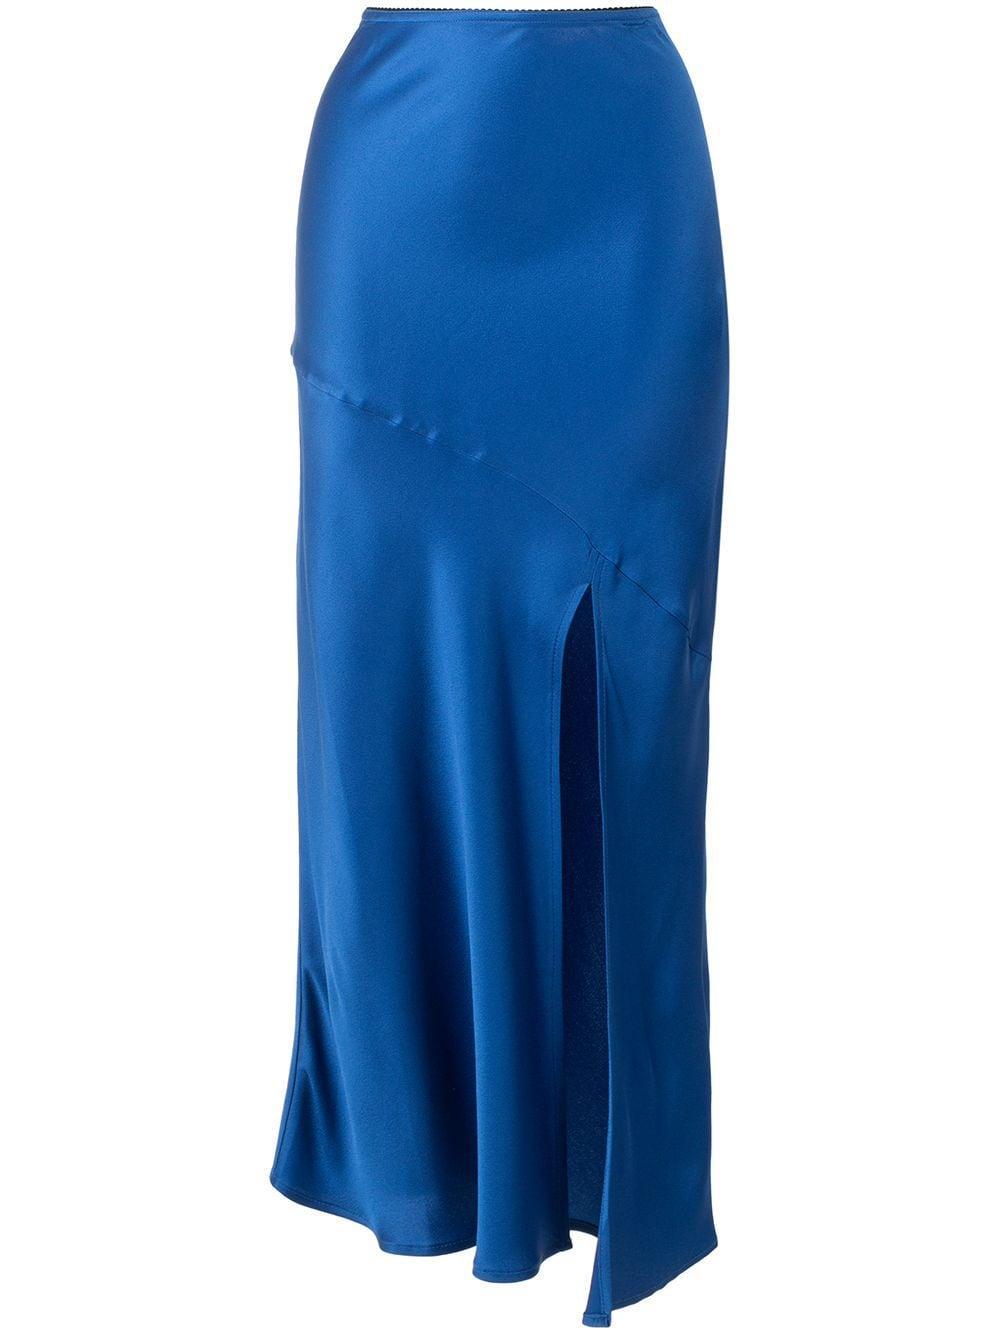 Eve Midi Skirt Item # L02G549-H20